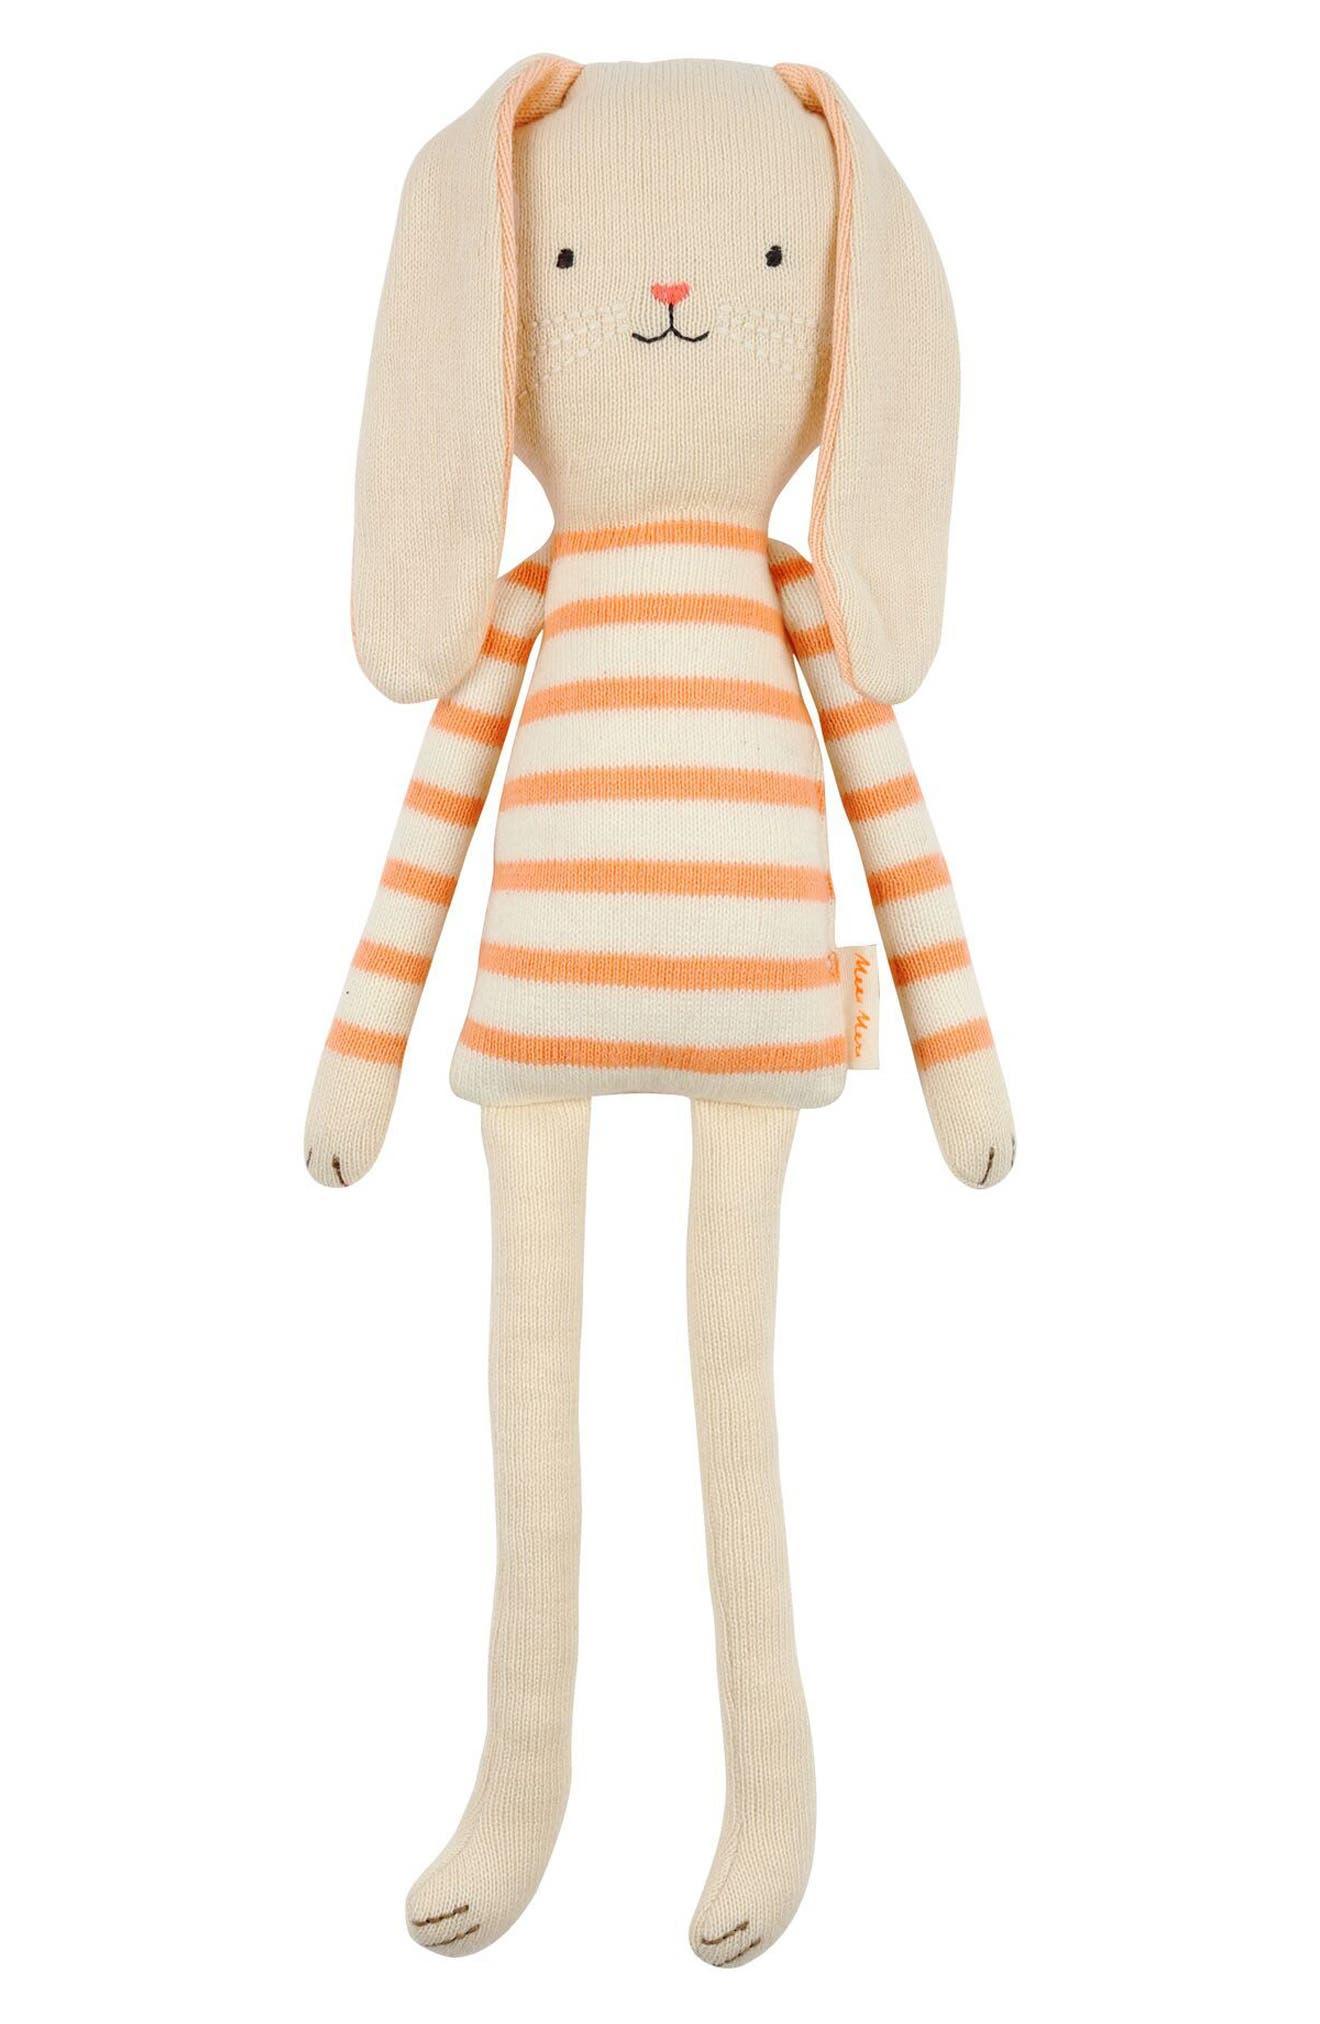 Small Stripe Sweater Organic Cotton Knit Bunny,                         Main,                         color, Coral